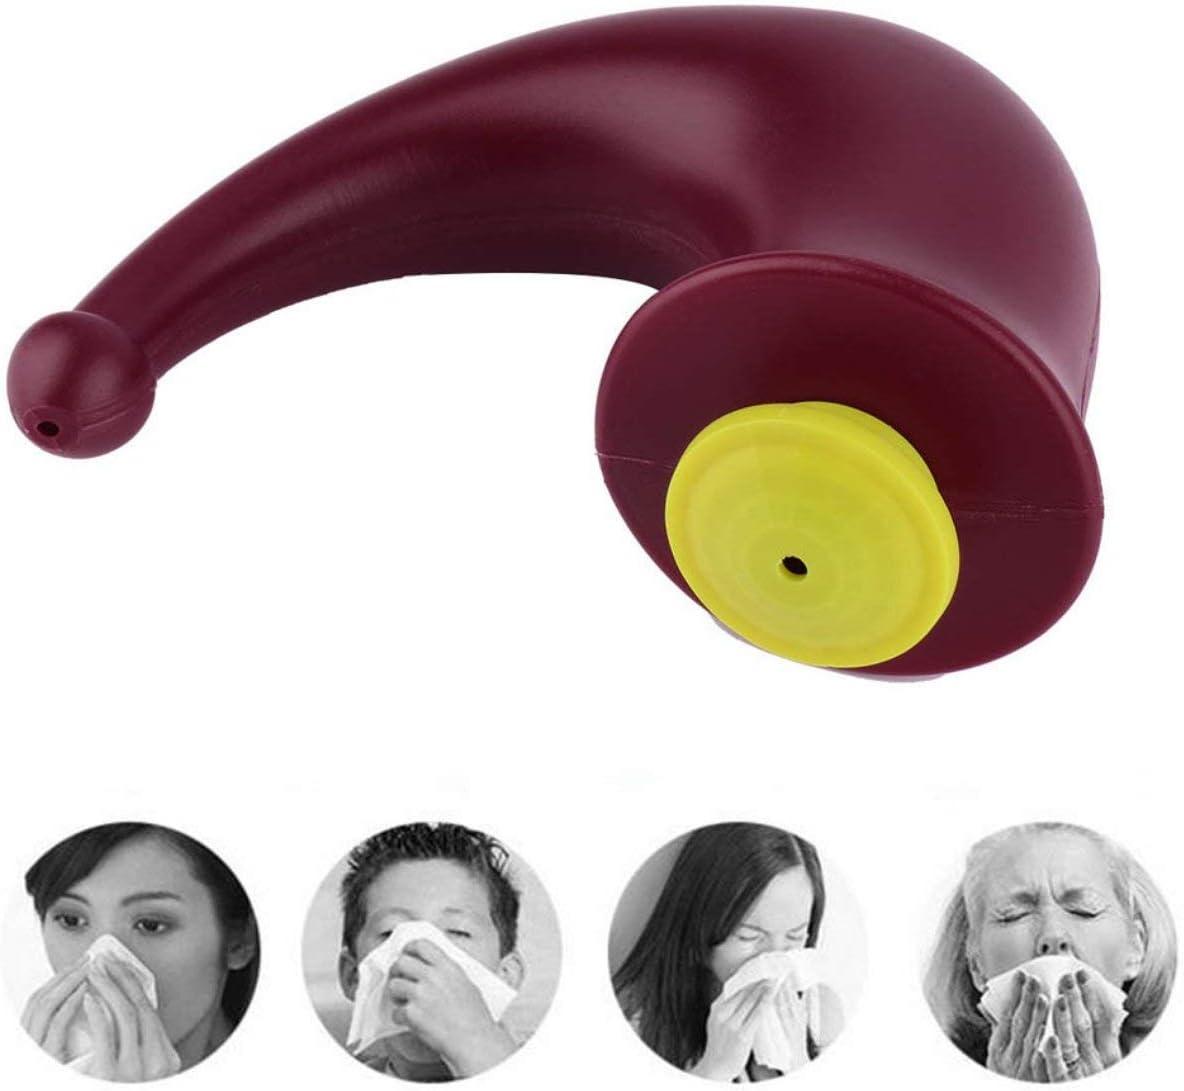 Wine Red /& Yellow Jasnyfall Nasal Rinsing Nose Wash System Neti Pot Sinus Irrigation Sinuses Cleaner for Complete Sinus Cleansing Wash Irrigation Relief